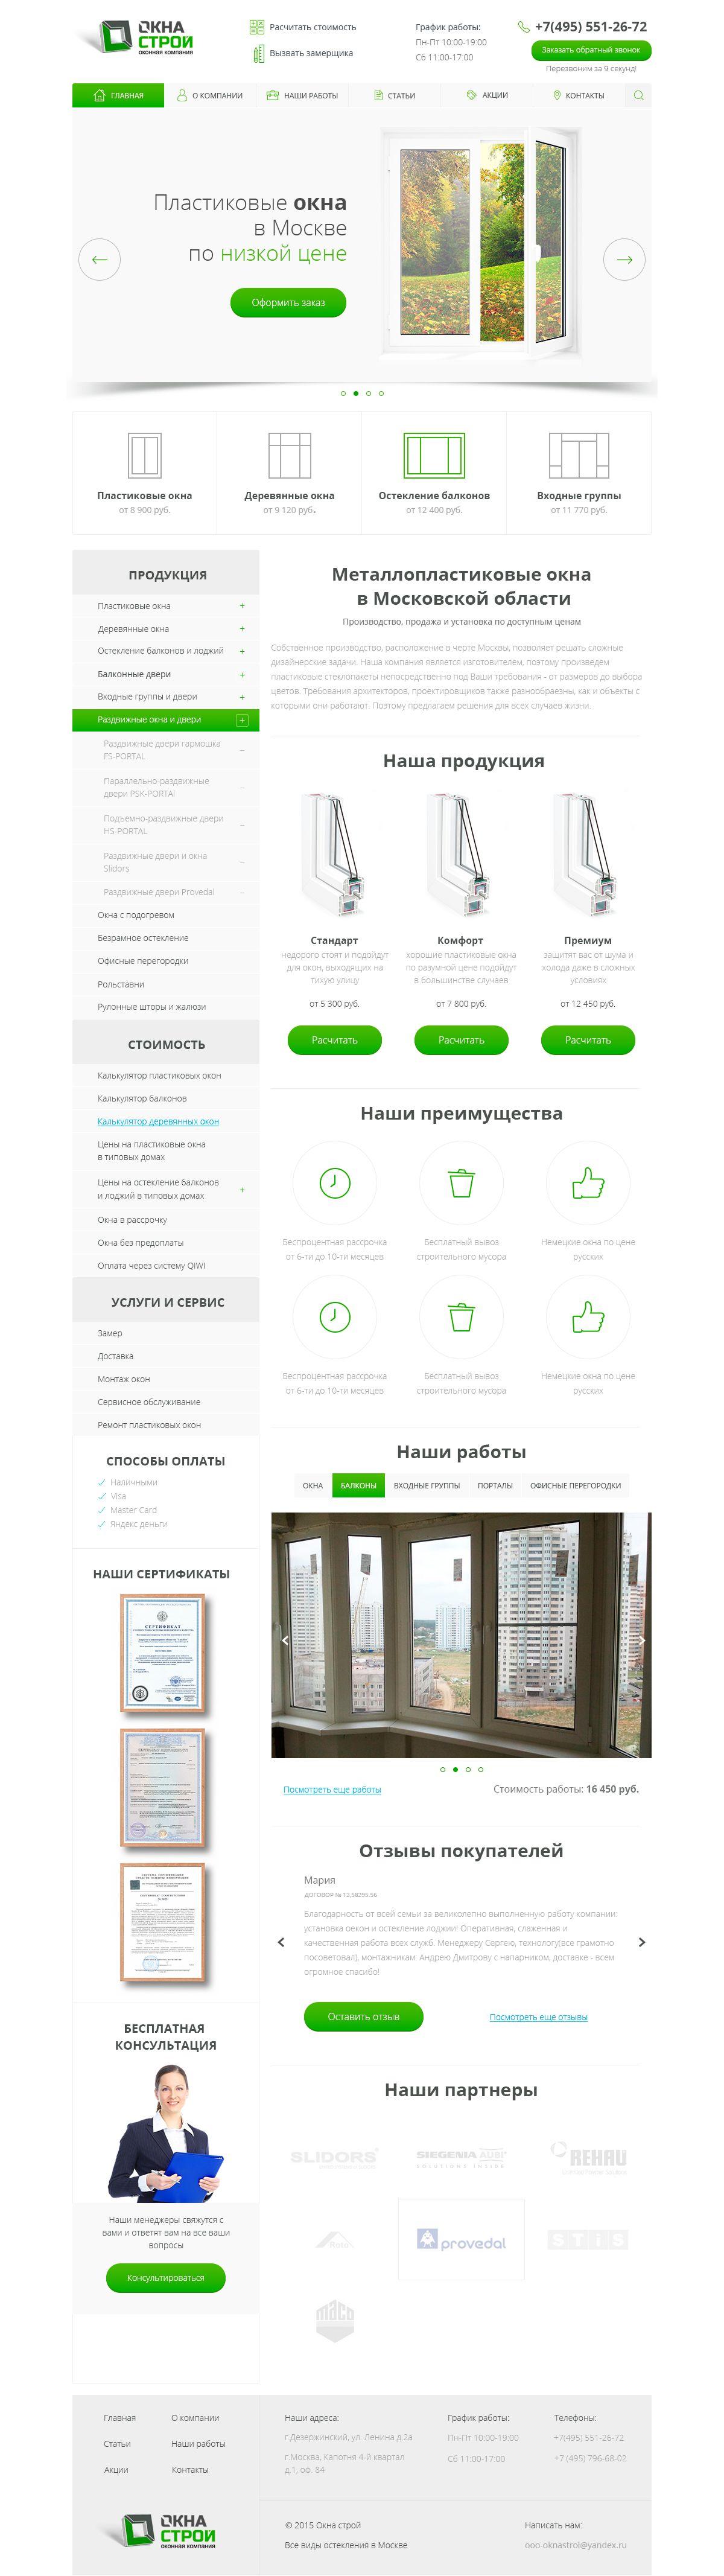 Landing page для http://teokna.ru/ - дизайнер Andrew8792